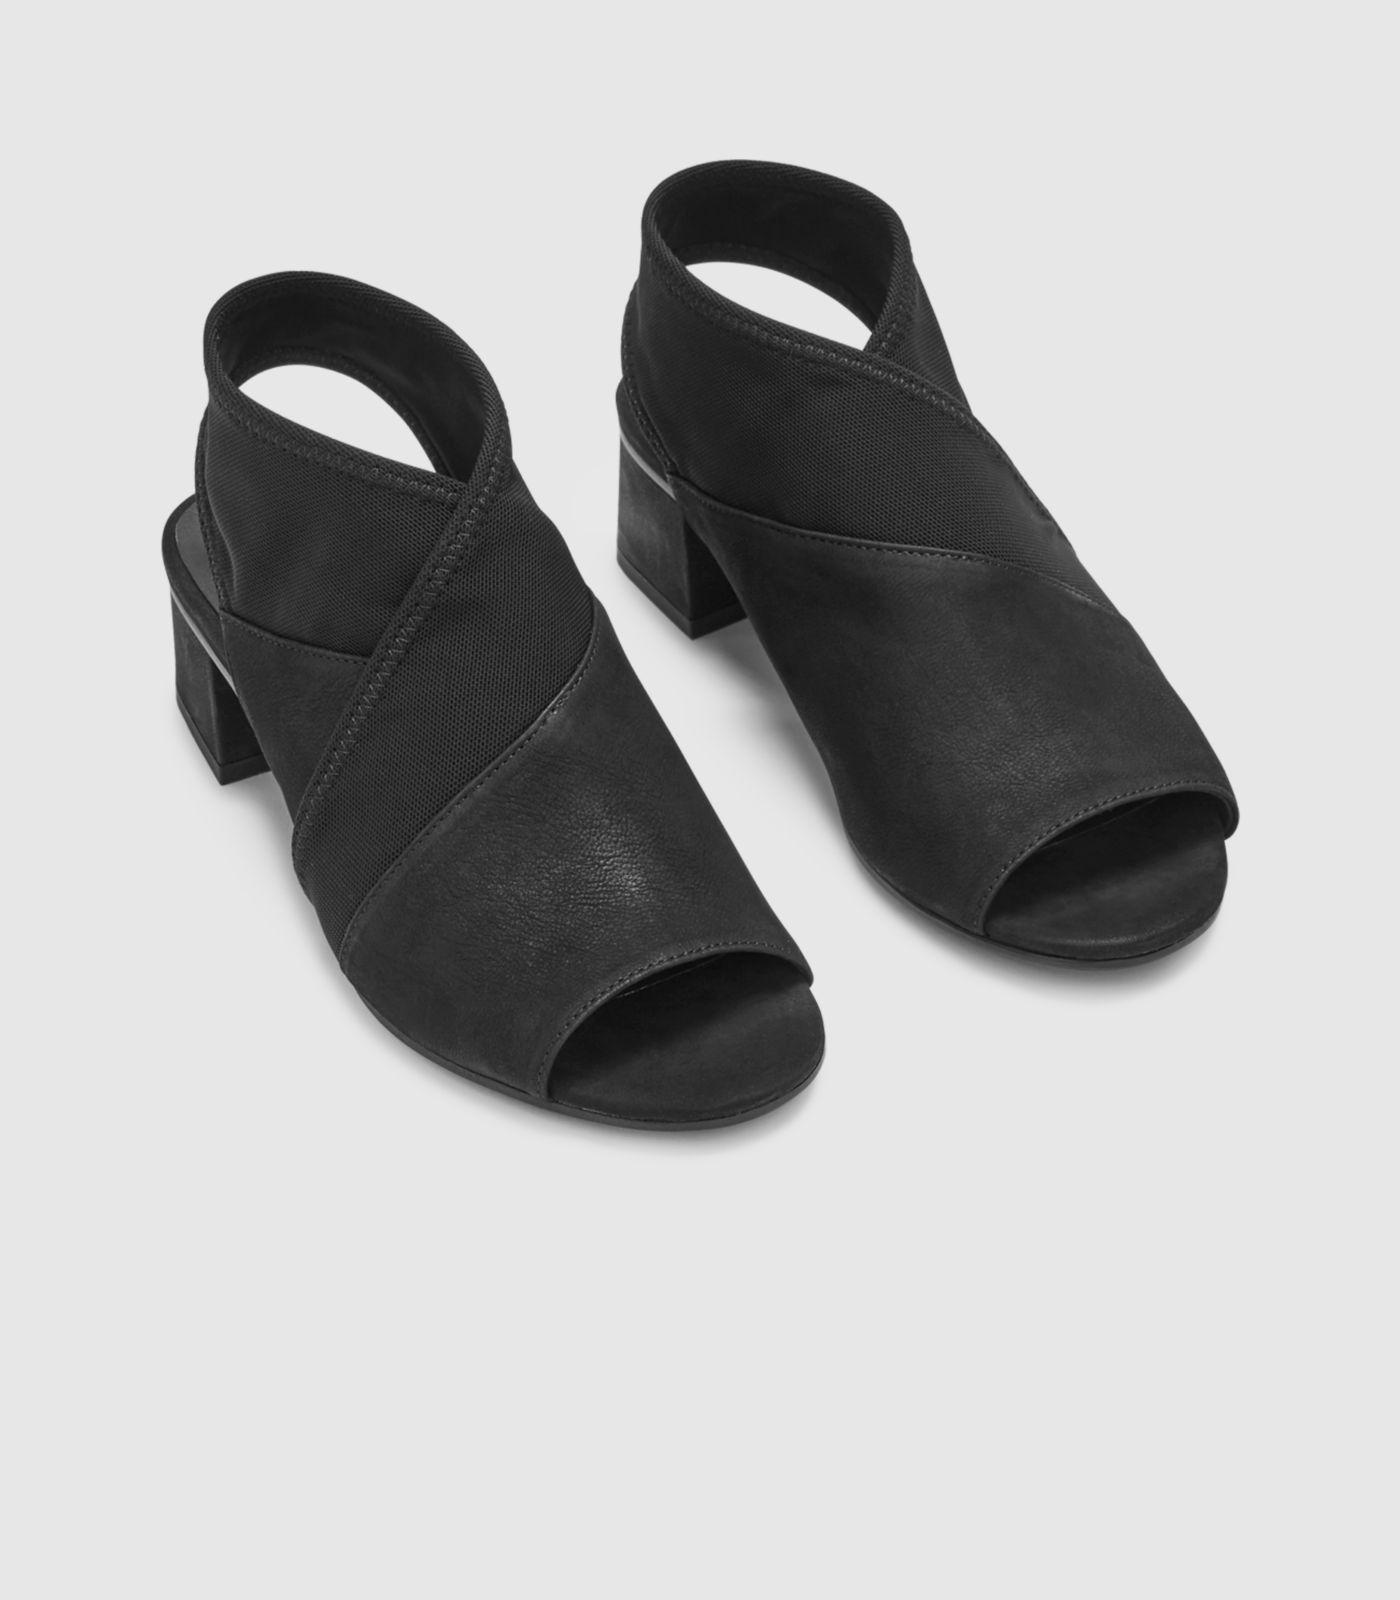 aa95e0dab08 Eileen Fisher - Black Luca Tumbled Nubuck Sandal - Lyst. View fullscreen